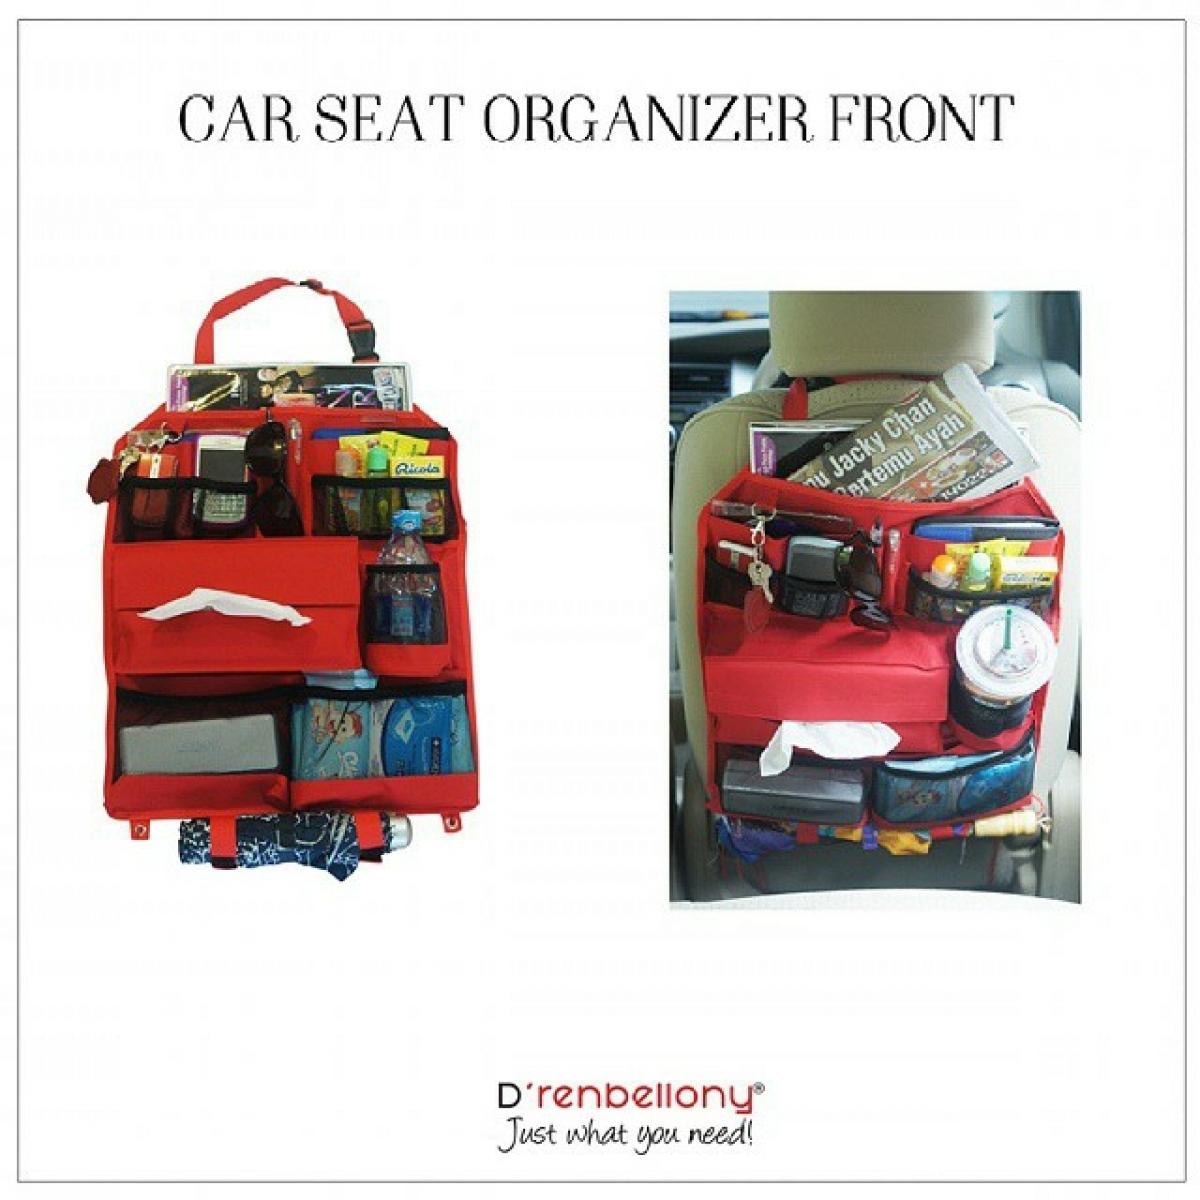 Car Seat Organizer Front D'renbellony (Tempat Penyimpanan Organiser Aksesoris Interior Jok Depan Mobil) Red